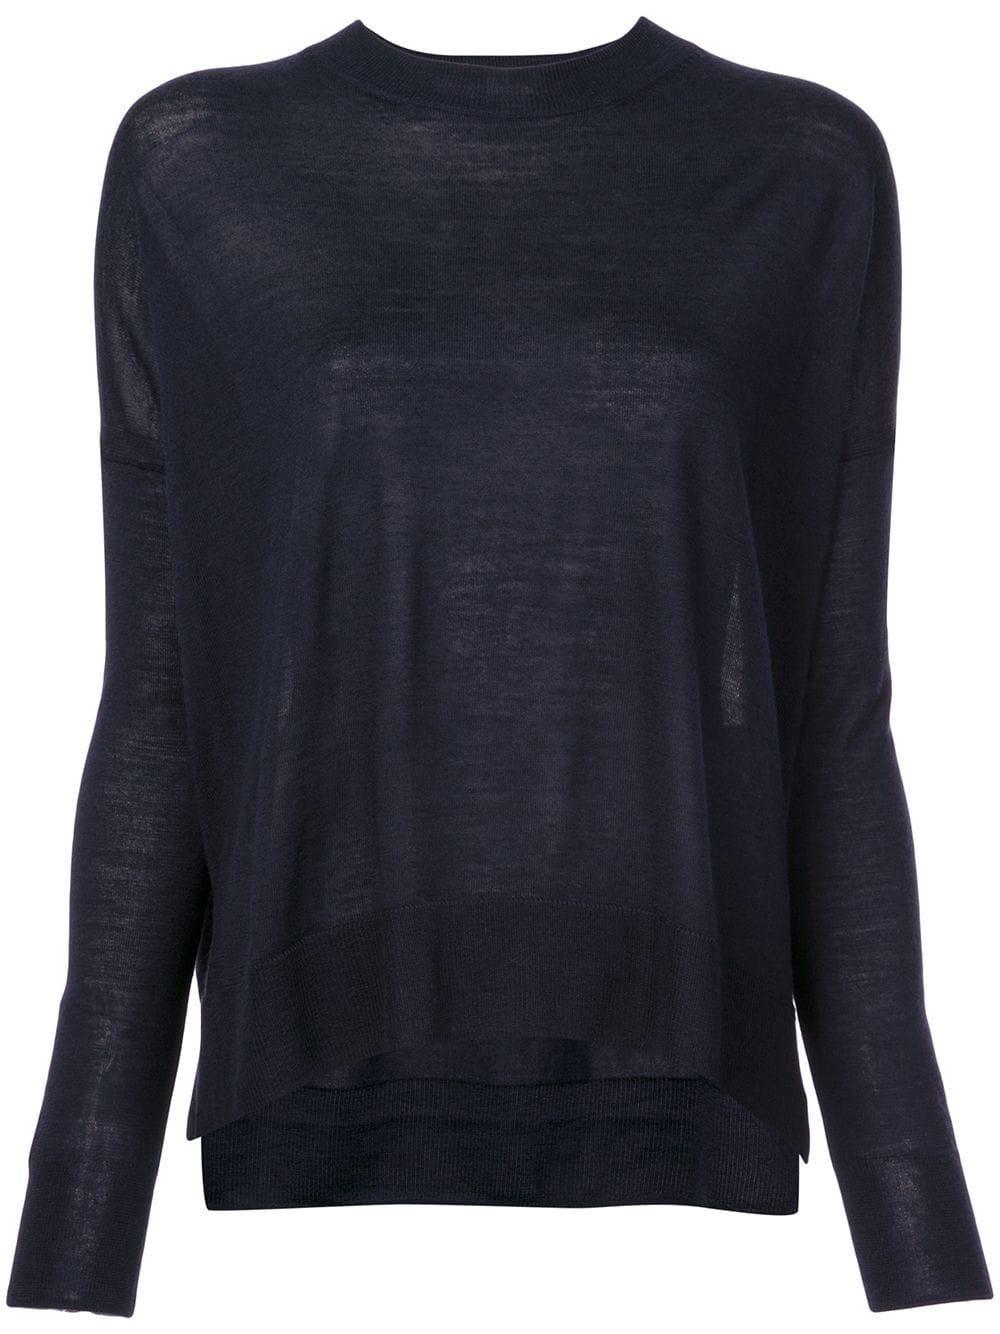 Boxy Crew Neck Sweater Item # TC00951SV-BASIC